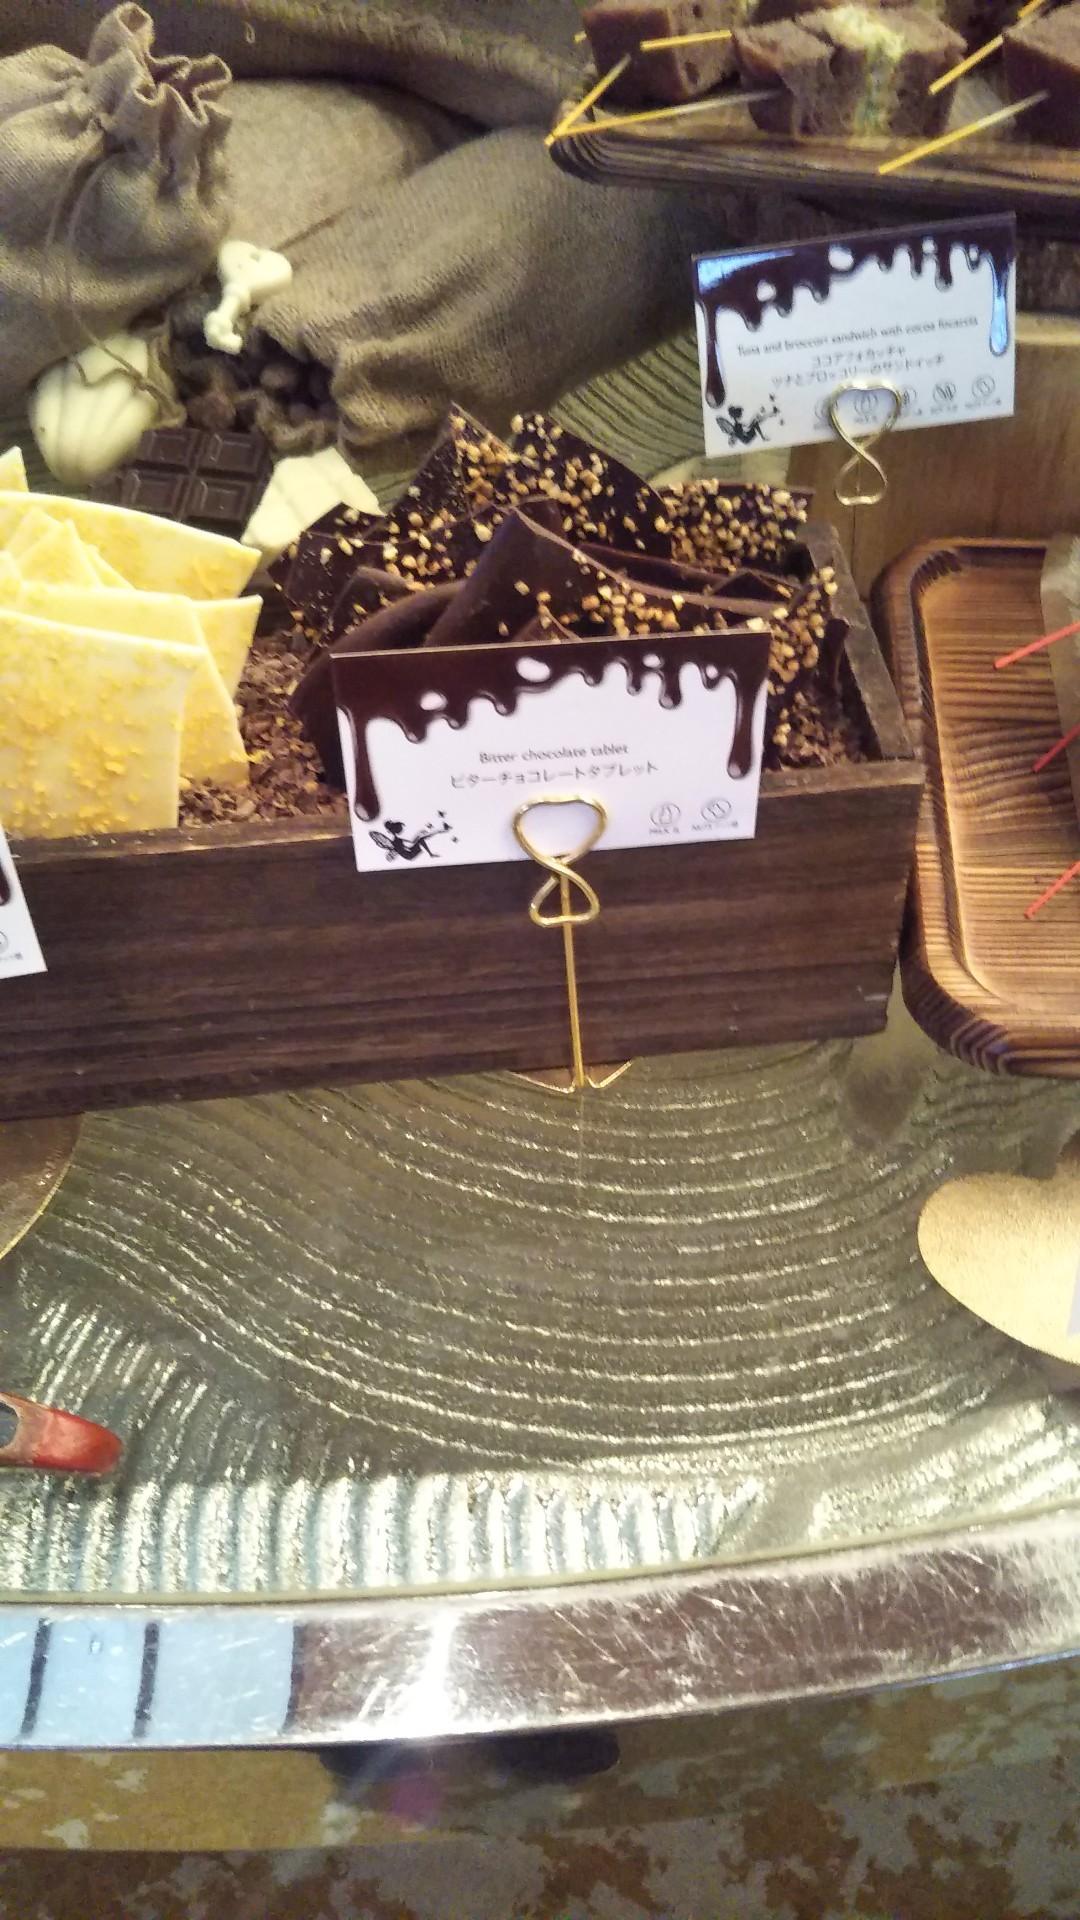 ANAインターコンチネンタルホテル東京 シャンパン・バー チョコレート・スイーツブッフェ_f0076001_21581769.jpg